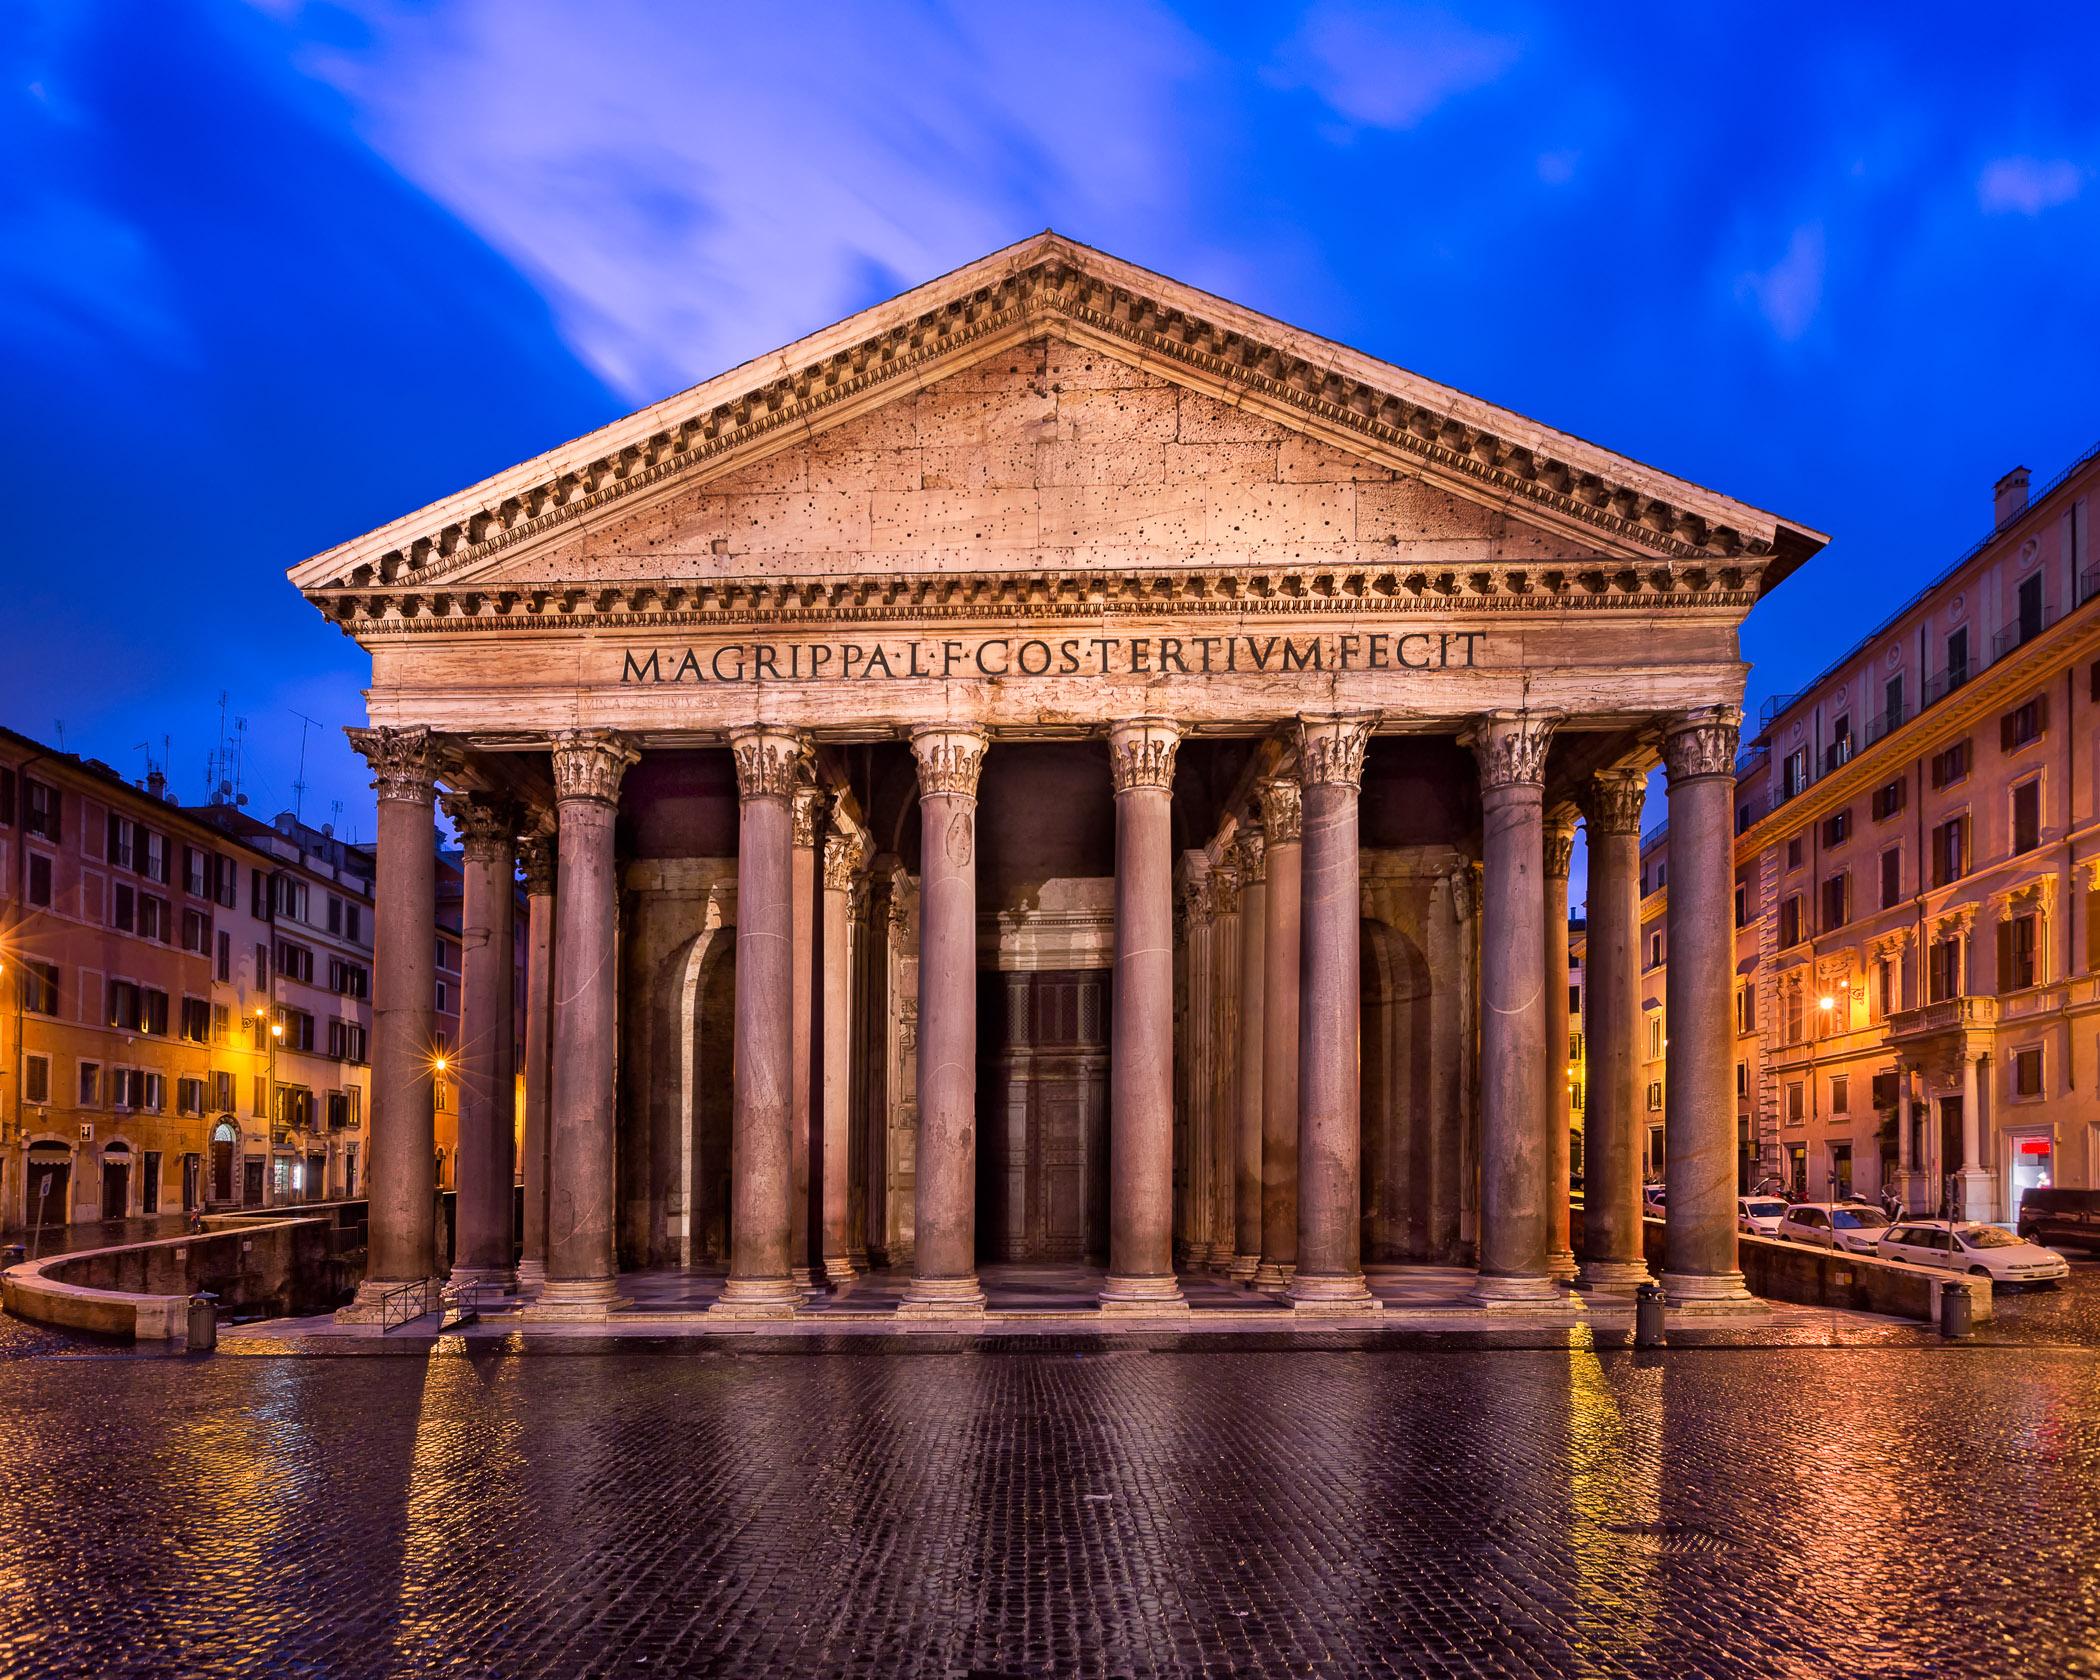 Pantheon and Piazza della Rotonda in the Morning, Rome, Italy